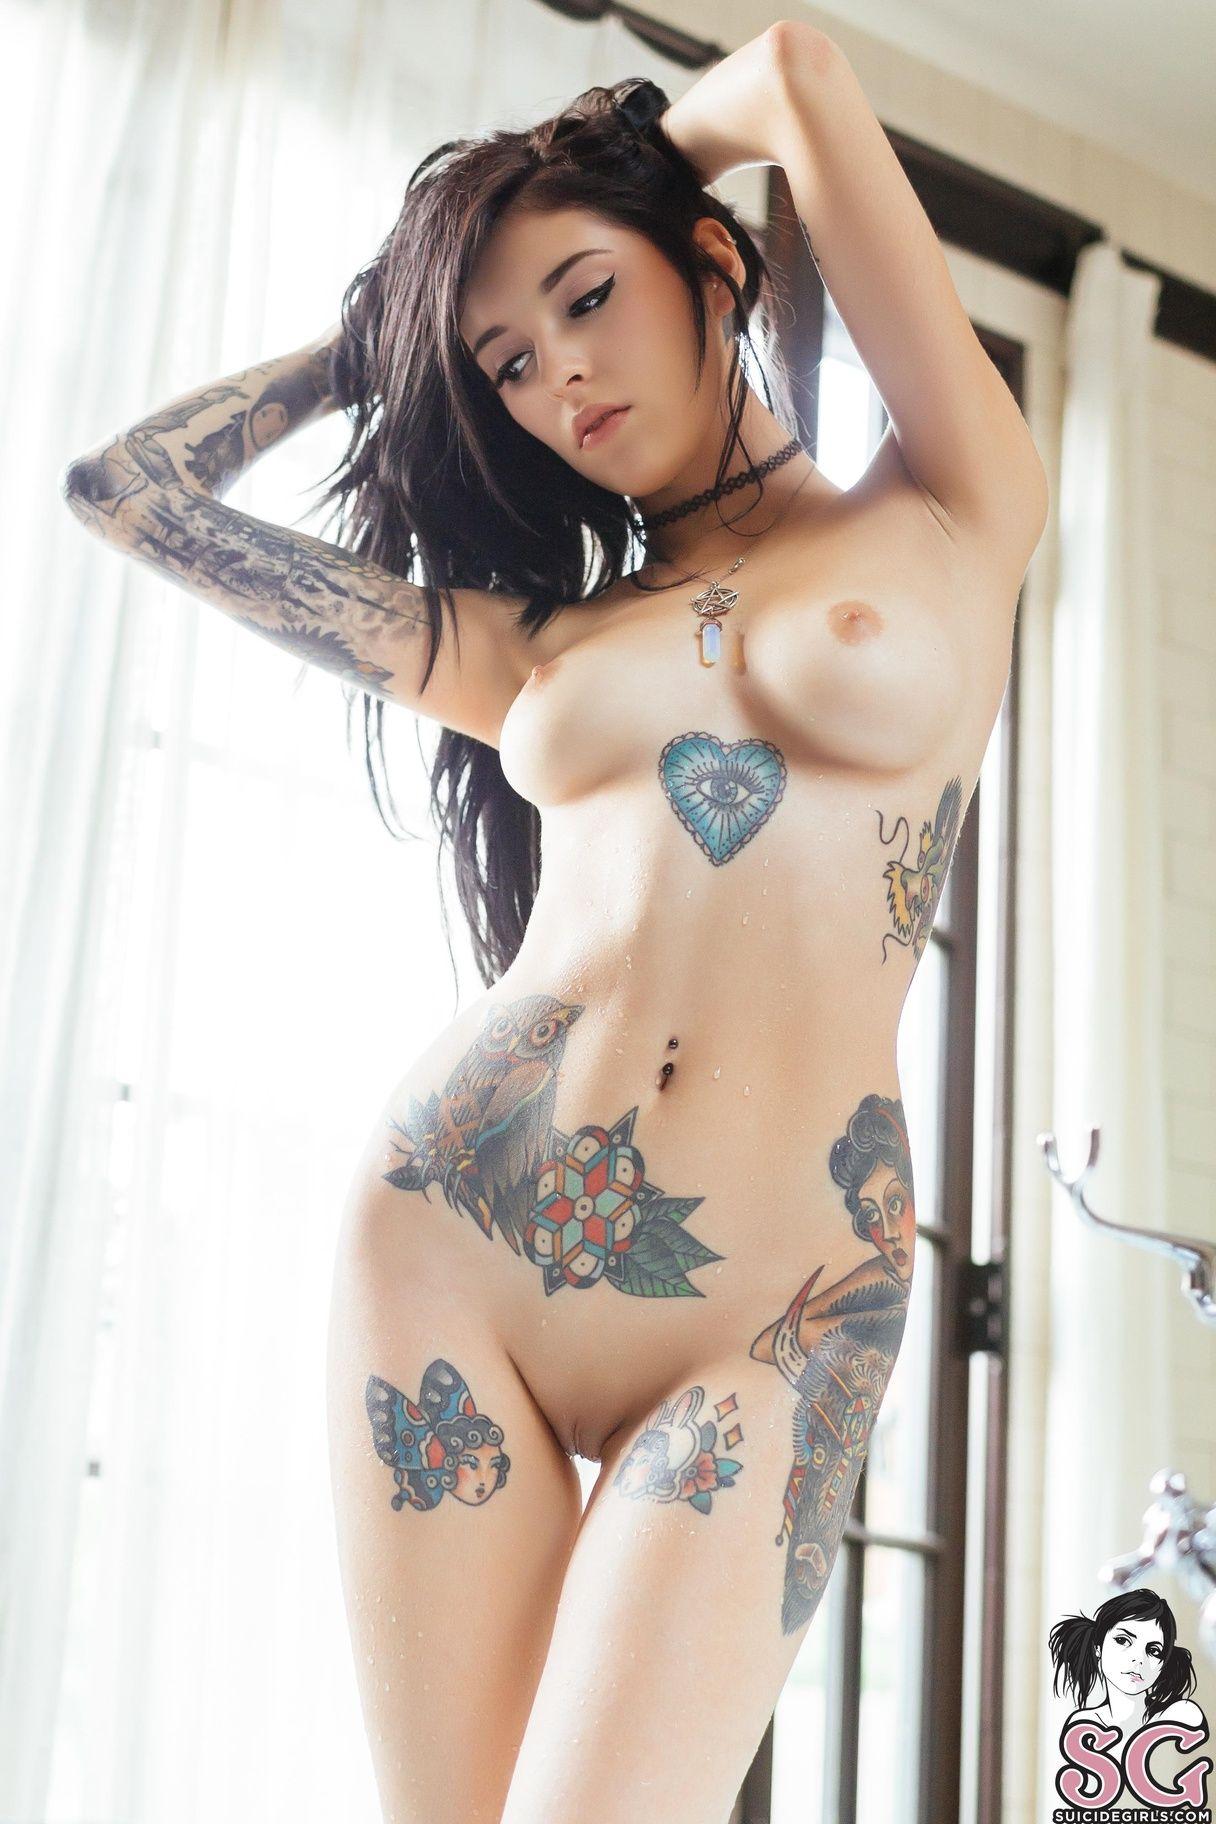 Boobs women nipples porn